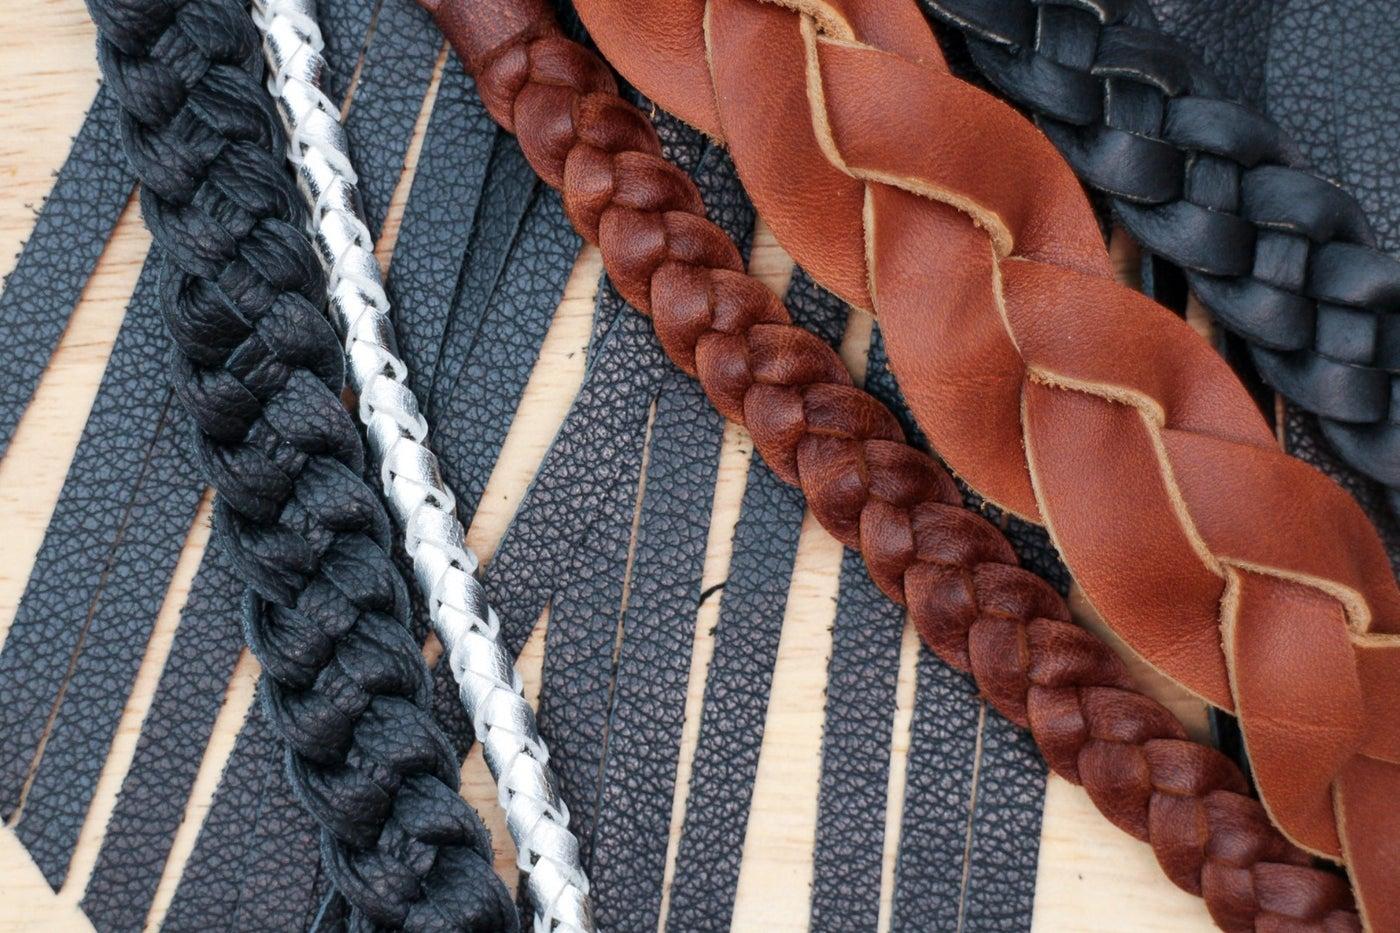 Making Leather Braids